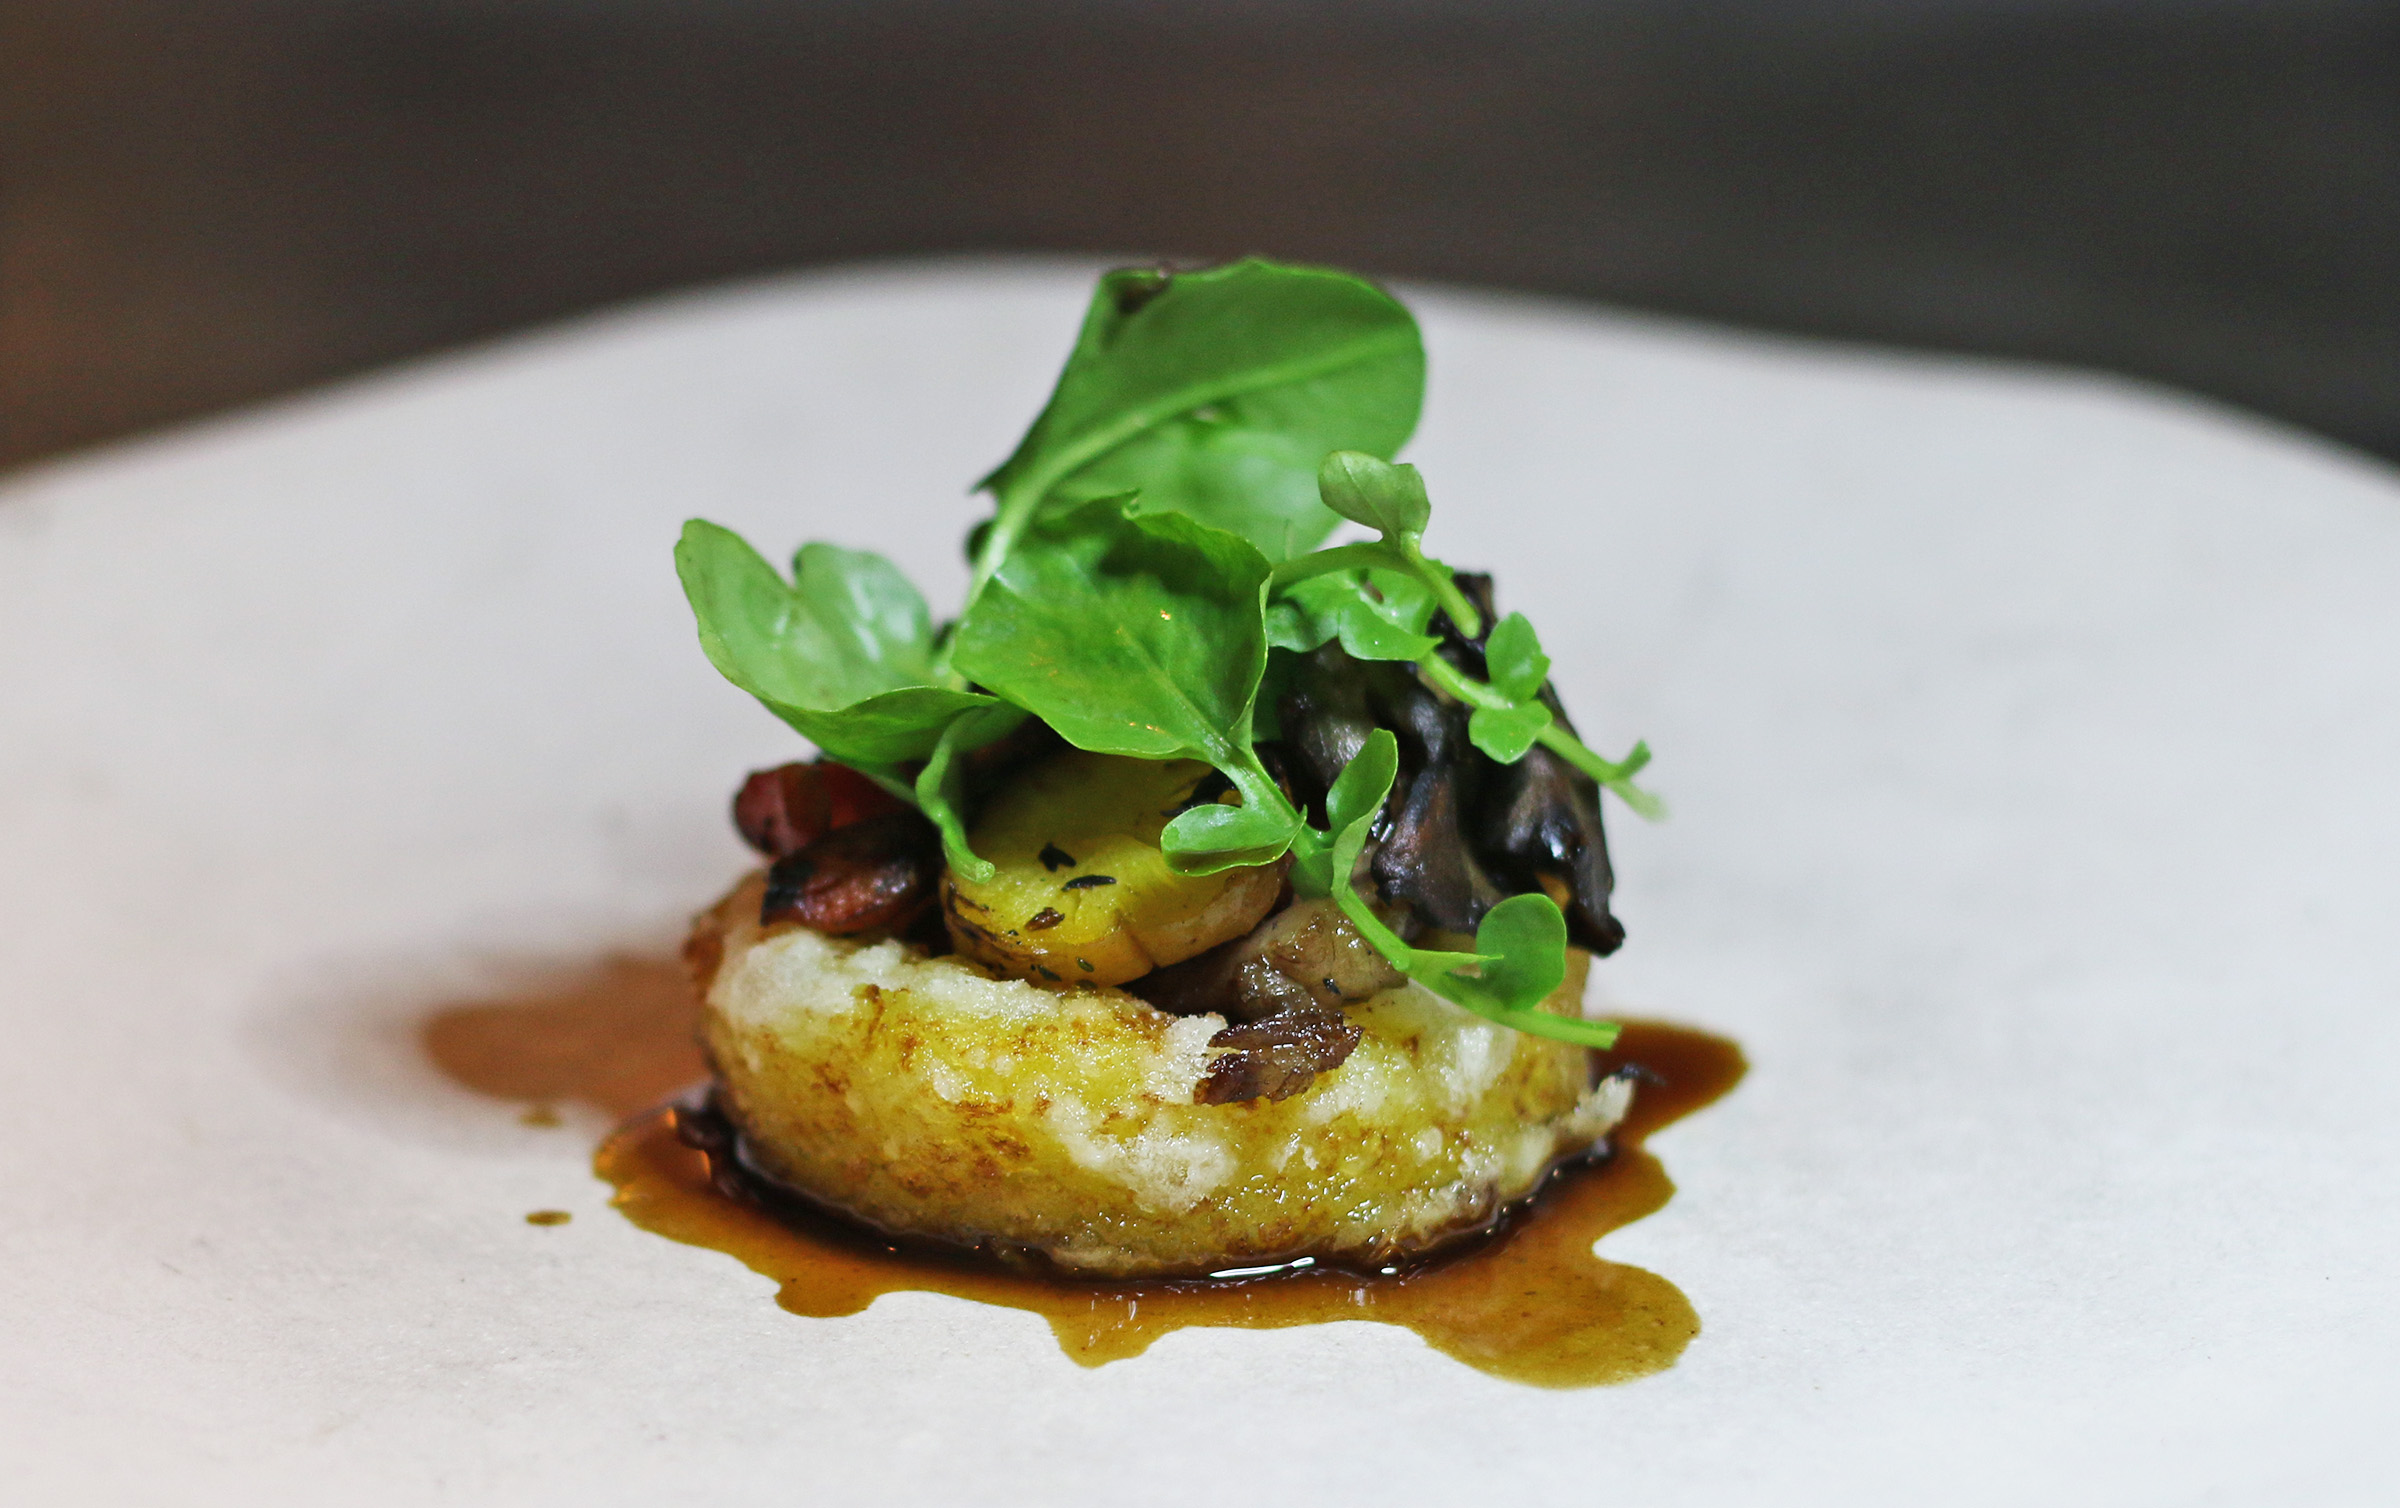 Wagyu served inside crispy potatoes. Roasted carrots and mushrooms with horfesradish demiglace.